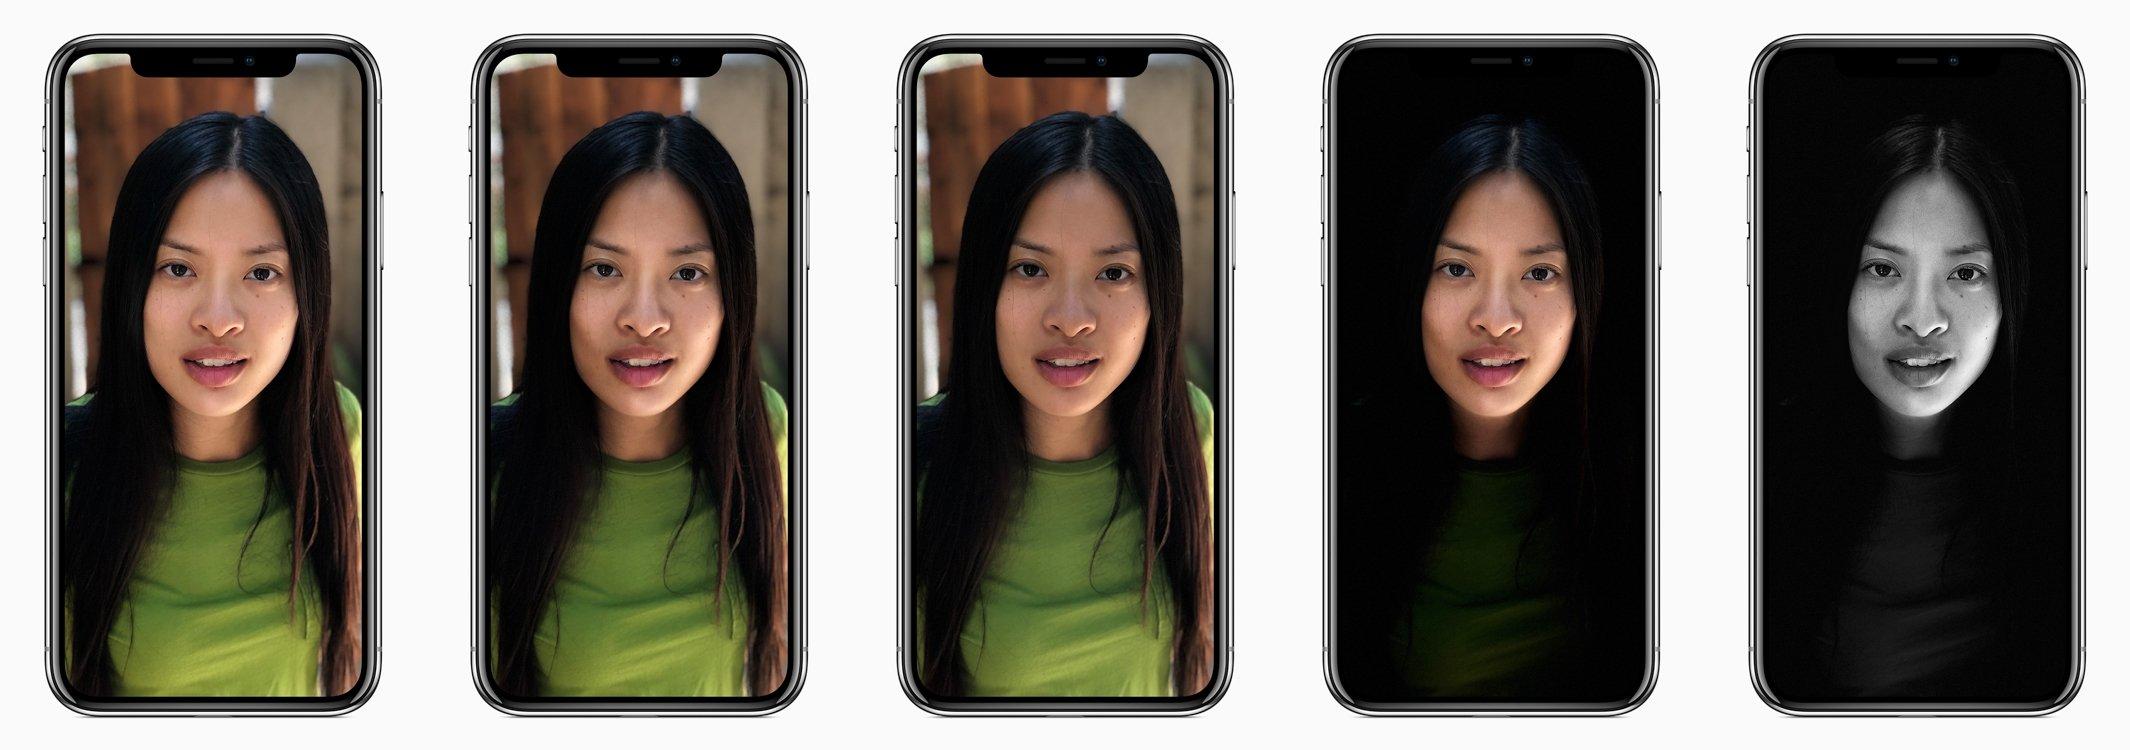 Portrait Lighting - iPhone X iOS 11